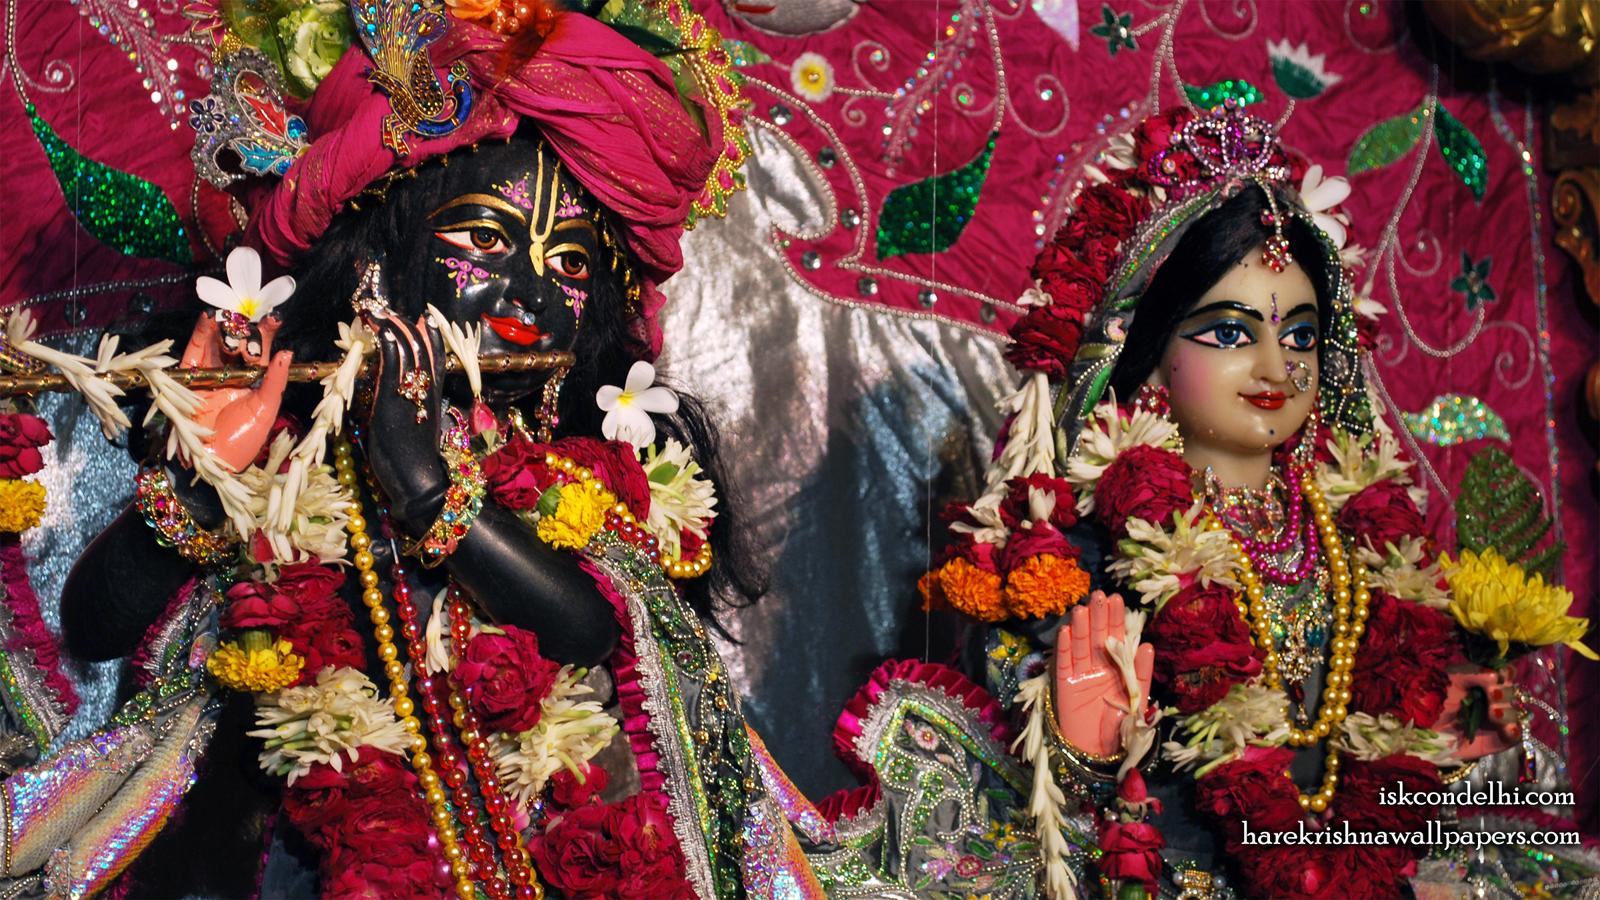 Sri Sri Radha Parthasarathi Close up Wallpaper (014) Size 1600x900 Download